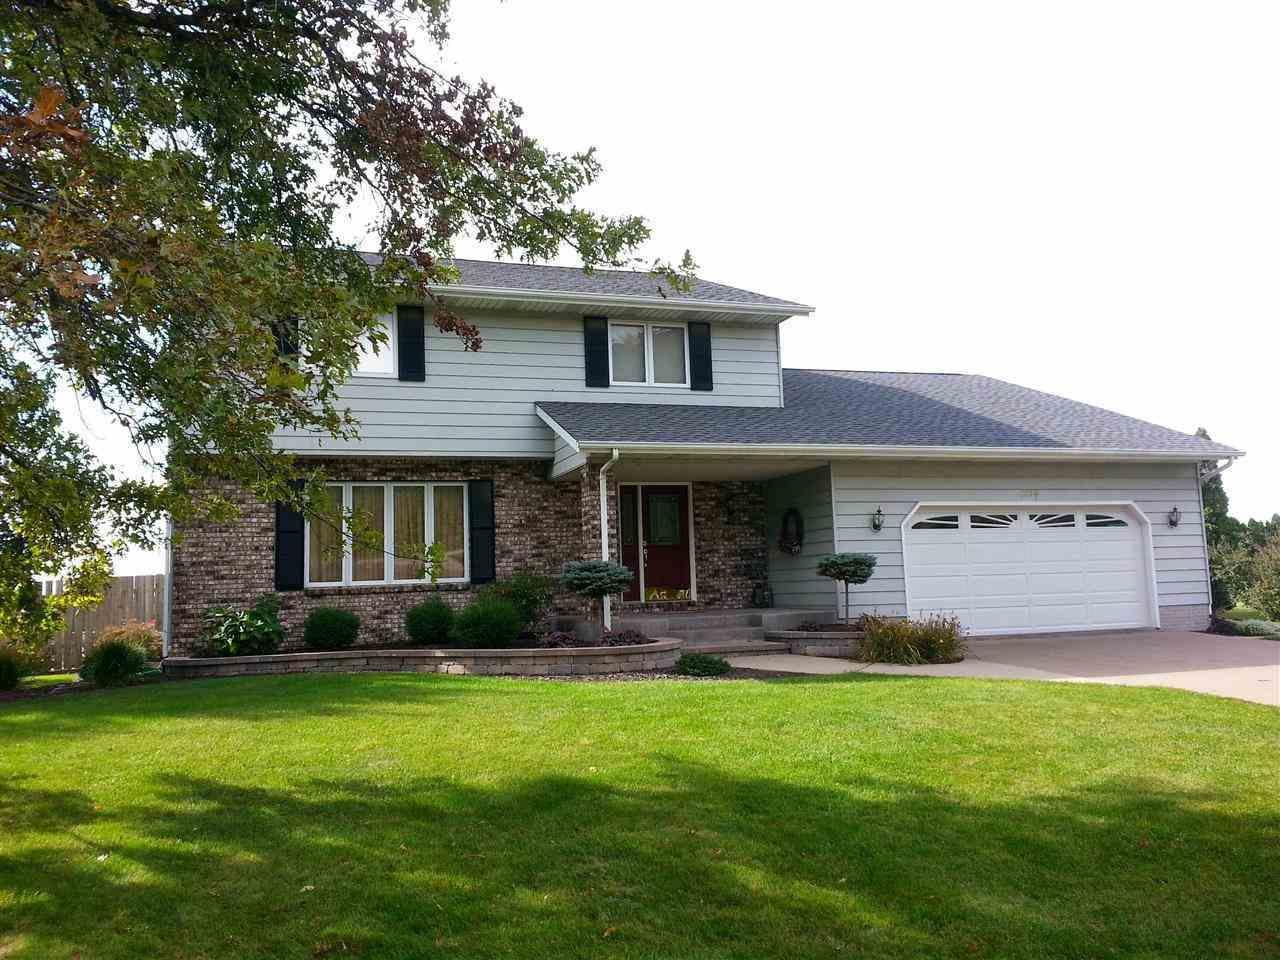 Real Estate for Sale, ListingId: 33232113, Orion,IL61273